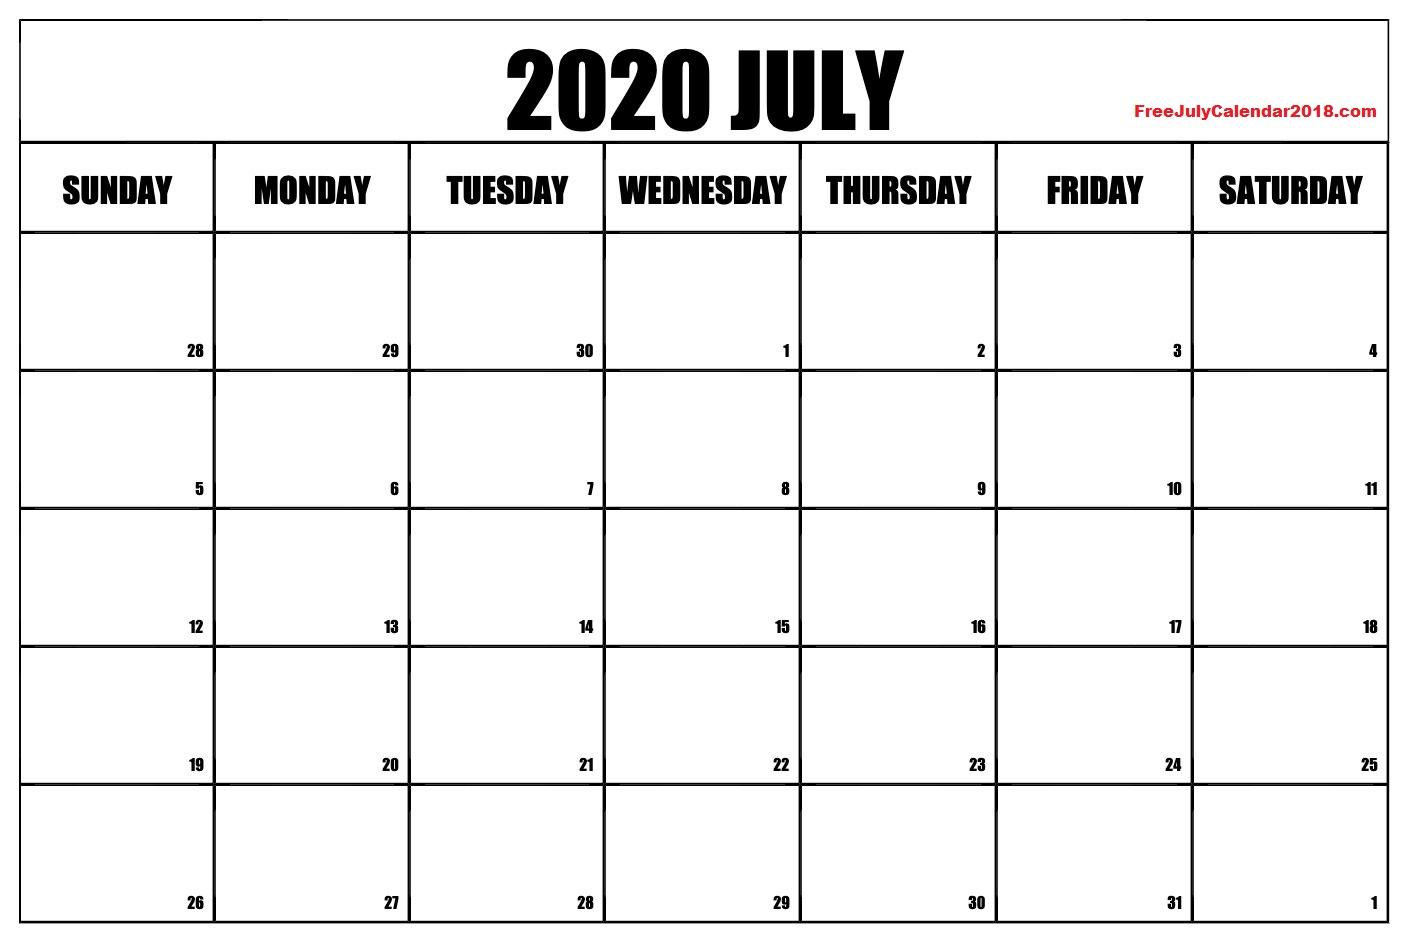 Calendar for July 2020